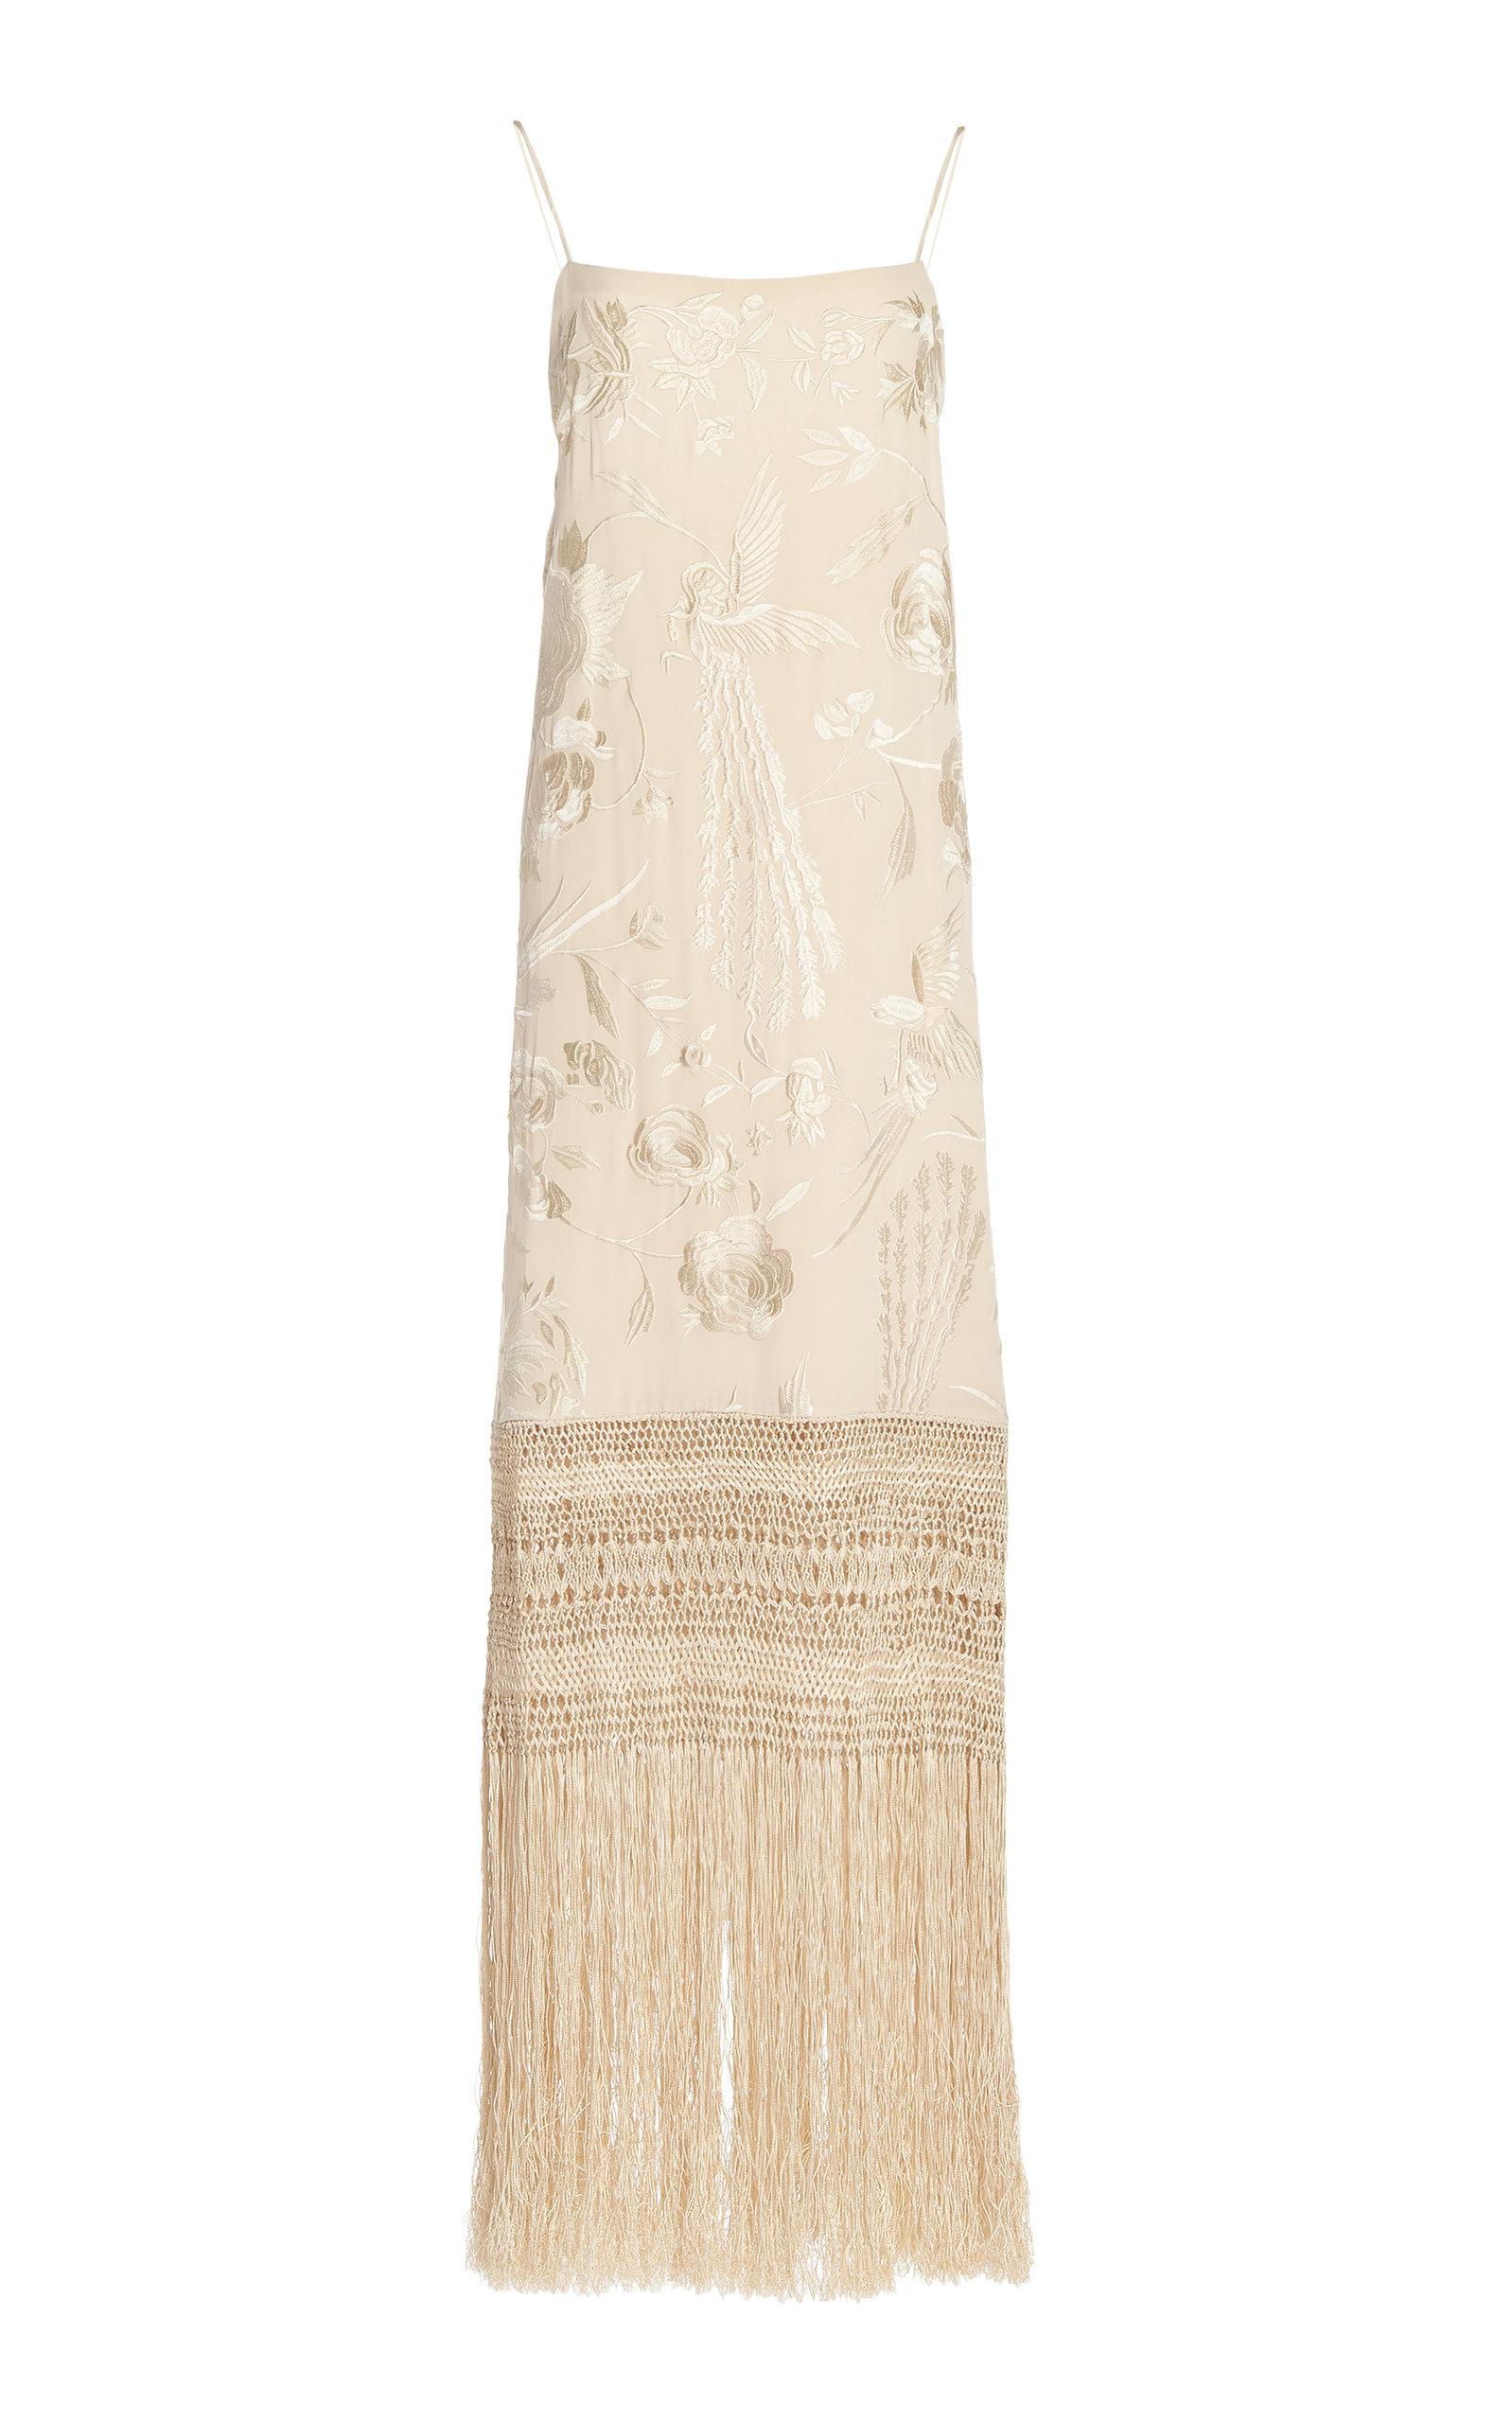 Johanna Ortiz PALM GOLD EMBROIDERED SILK DRESS